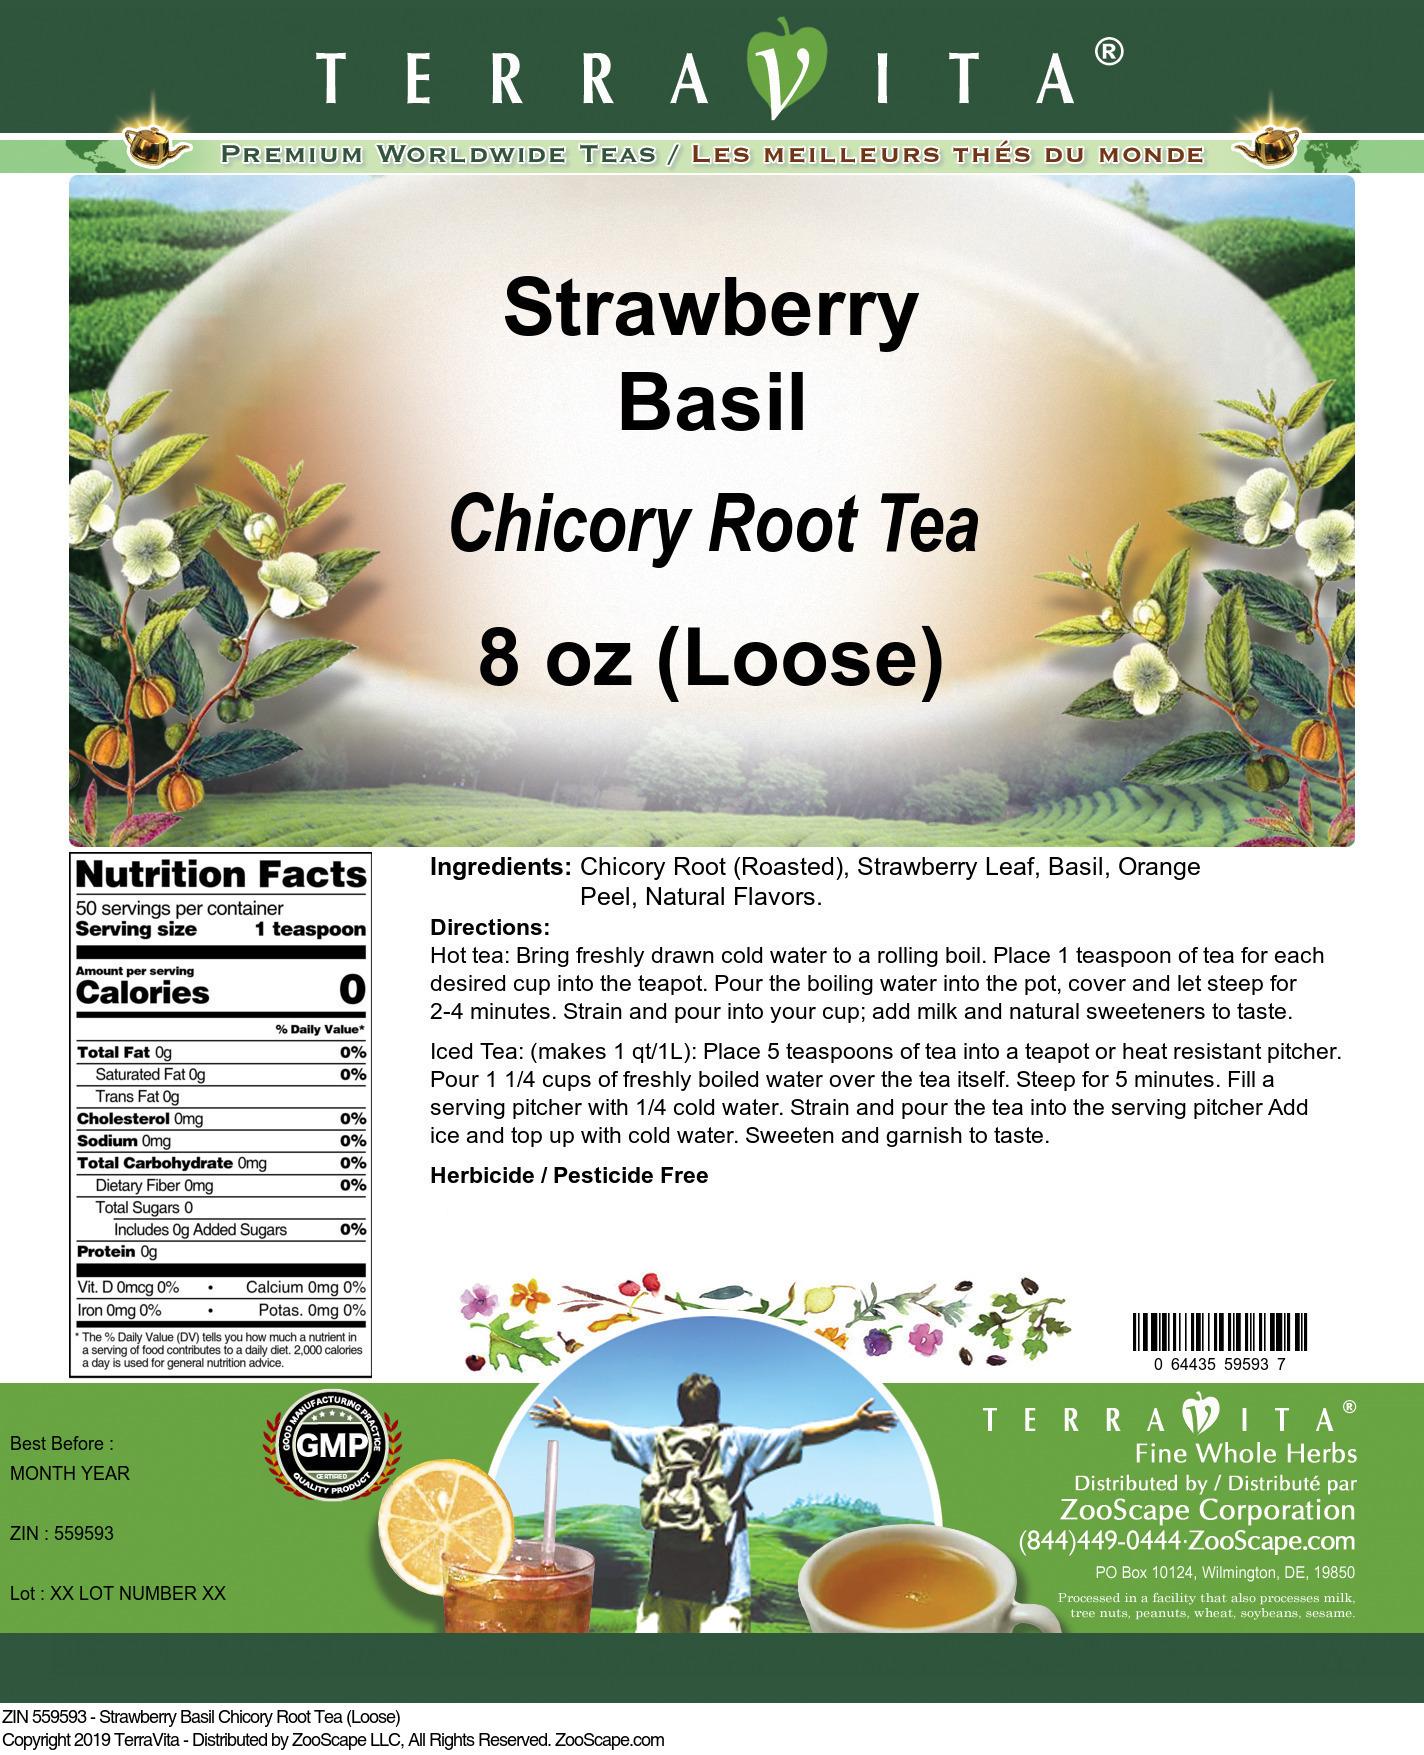 Strawberry Basil Chicory Root